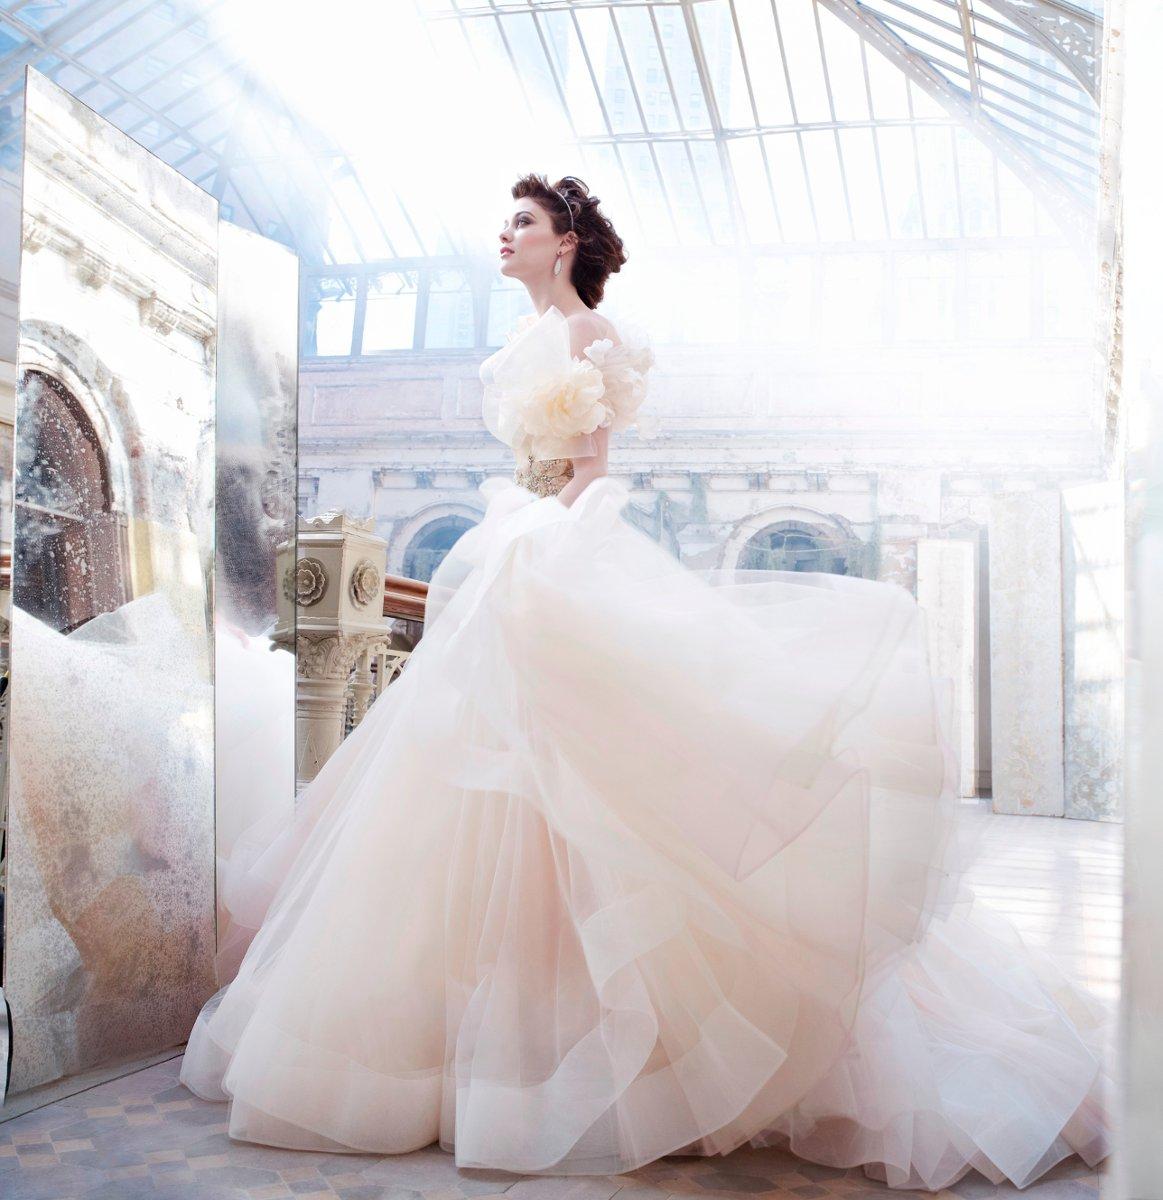 WhiteAzalea Elegant Dresses: Dreamlike Fairy Tale Wedding